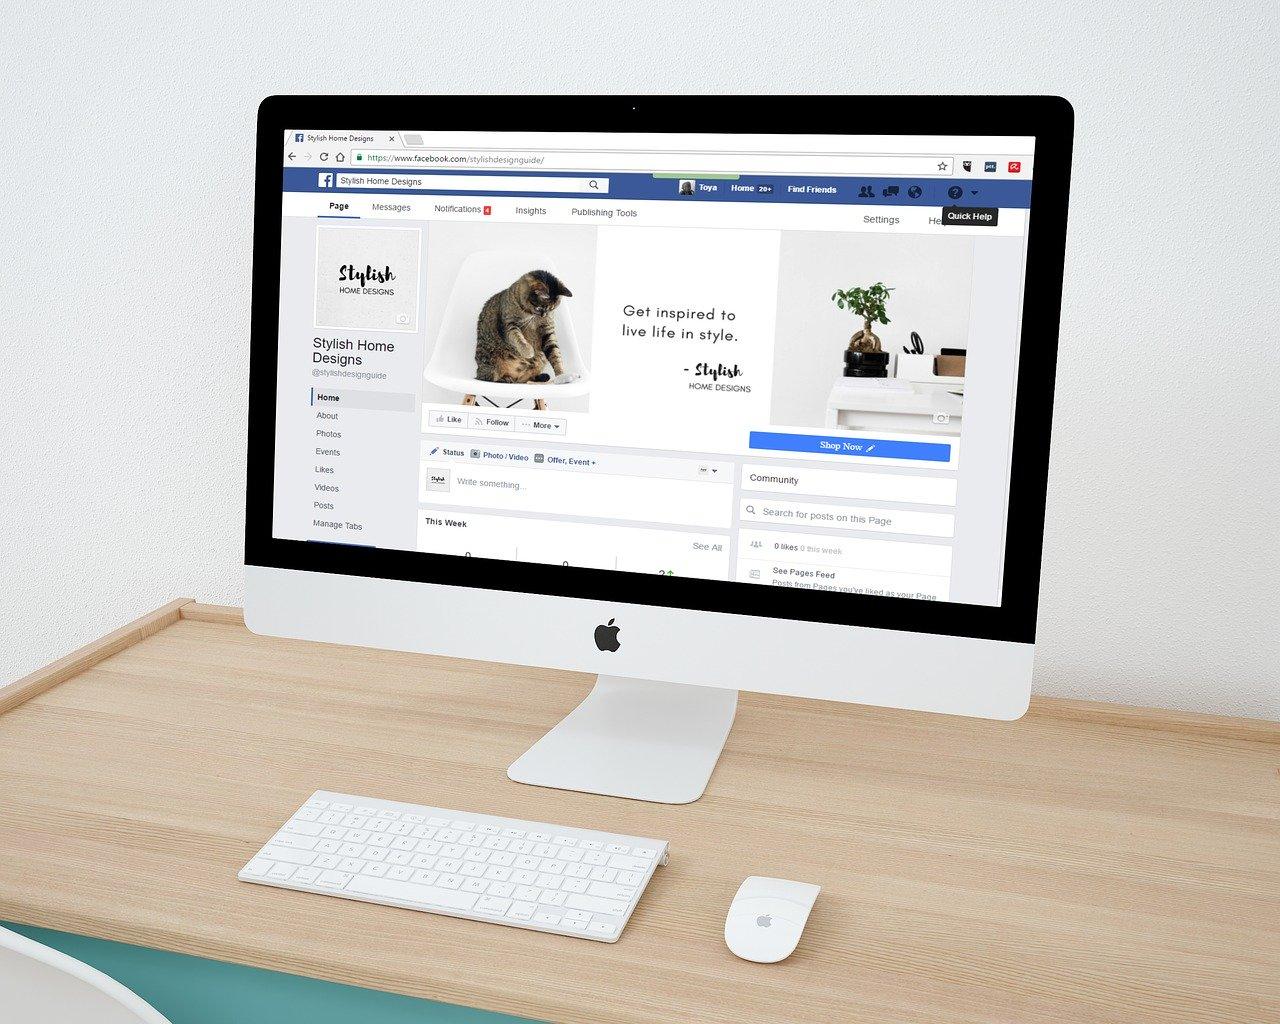 Facebook in MAC Computer